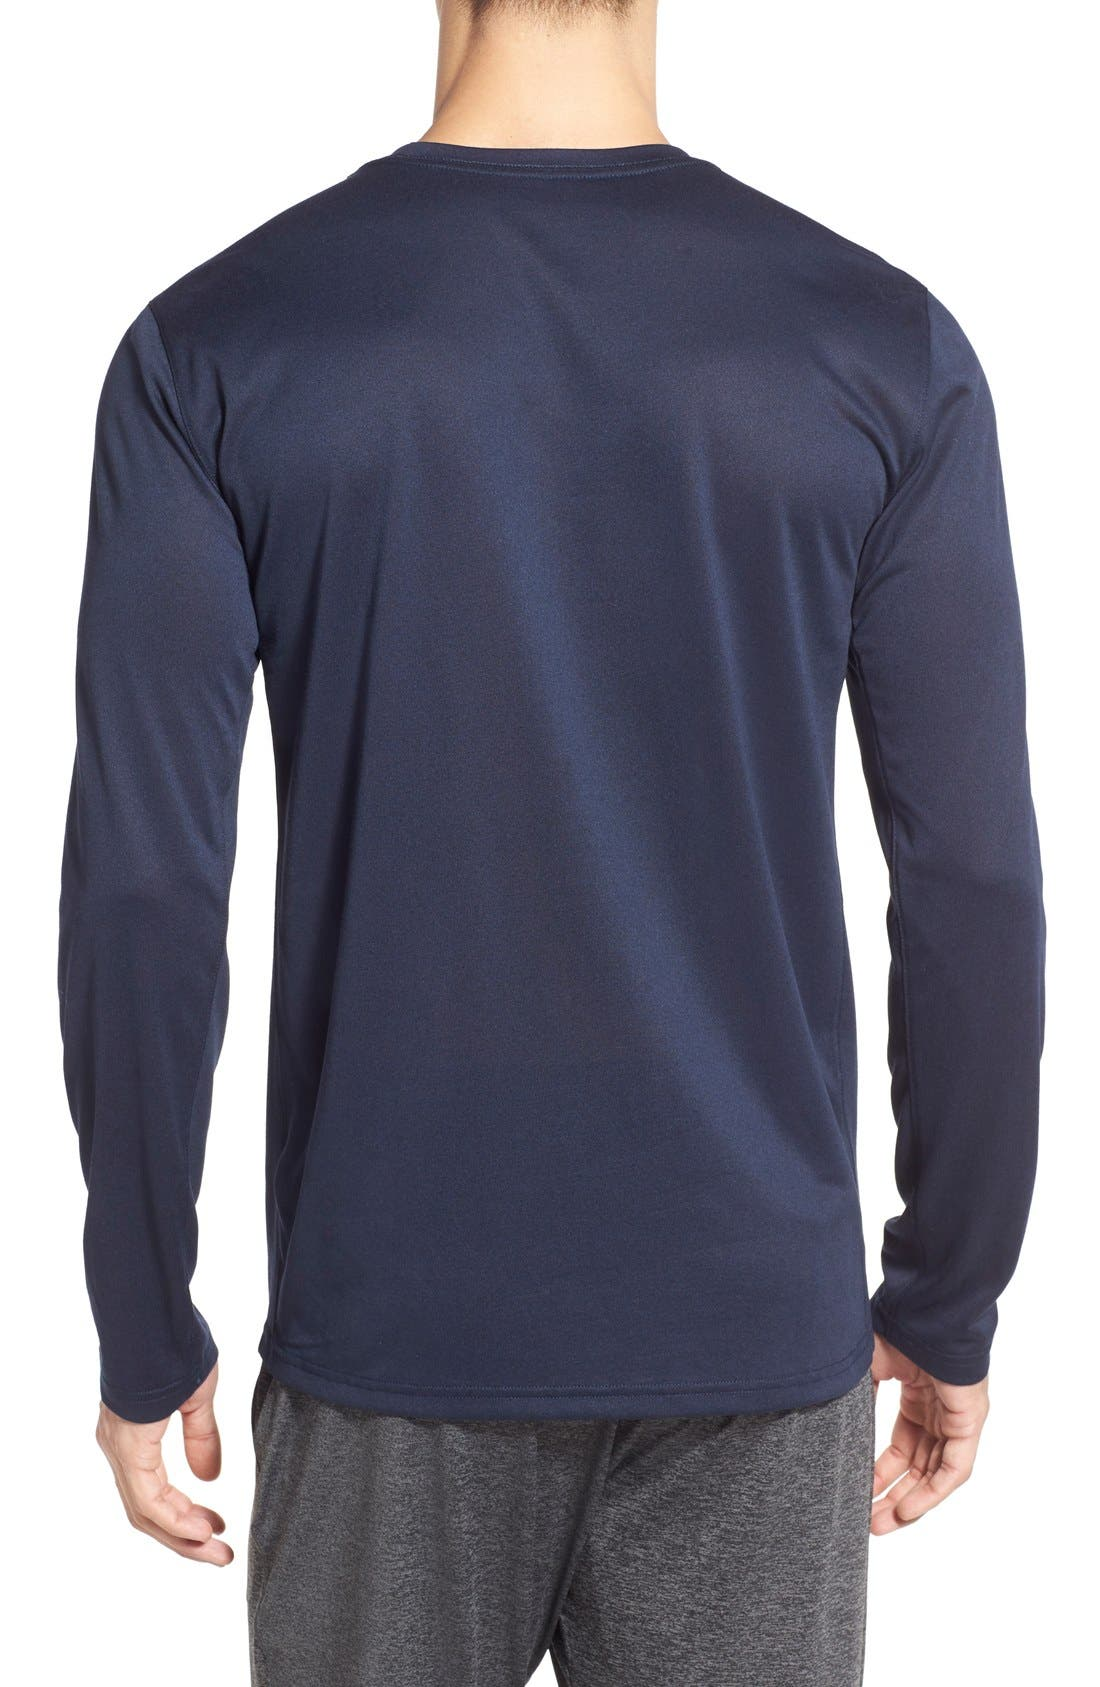 Alternate Image 2  - Nike 'Legend 2.0' Long Sleeve Dri-FIT Training T-Shirt